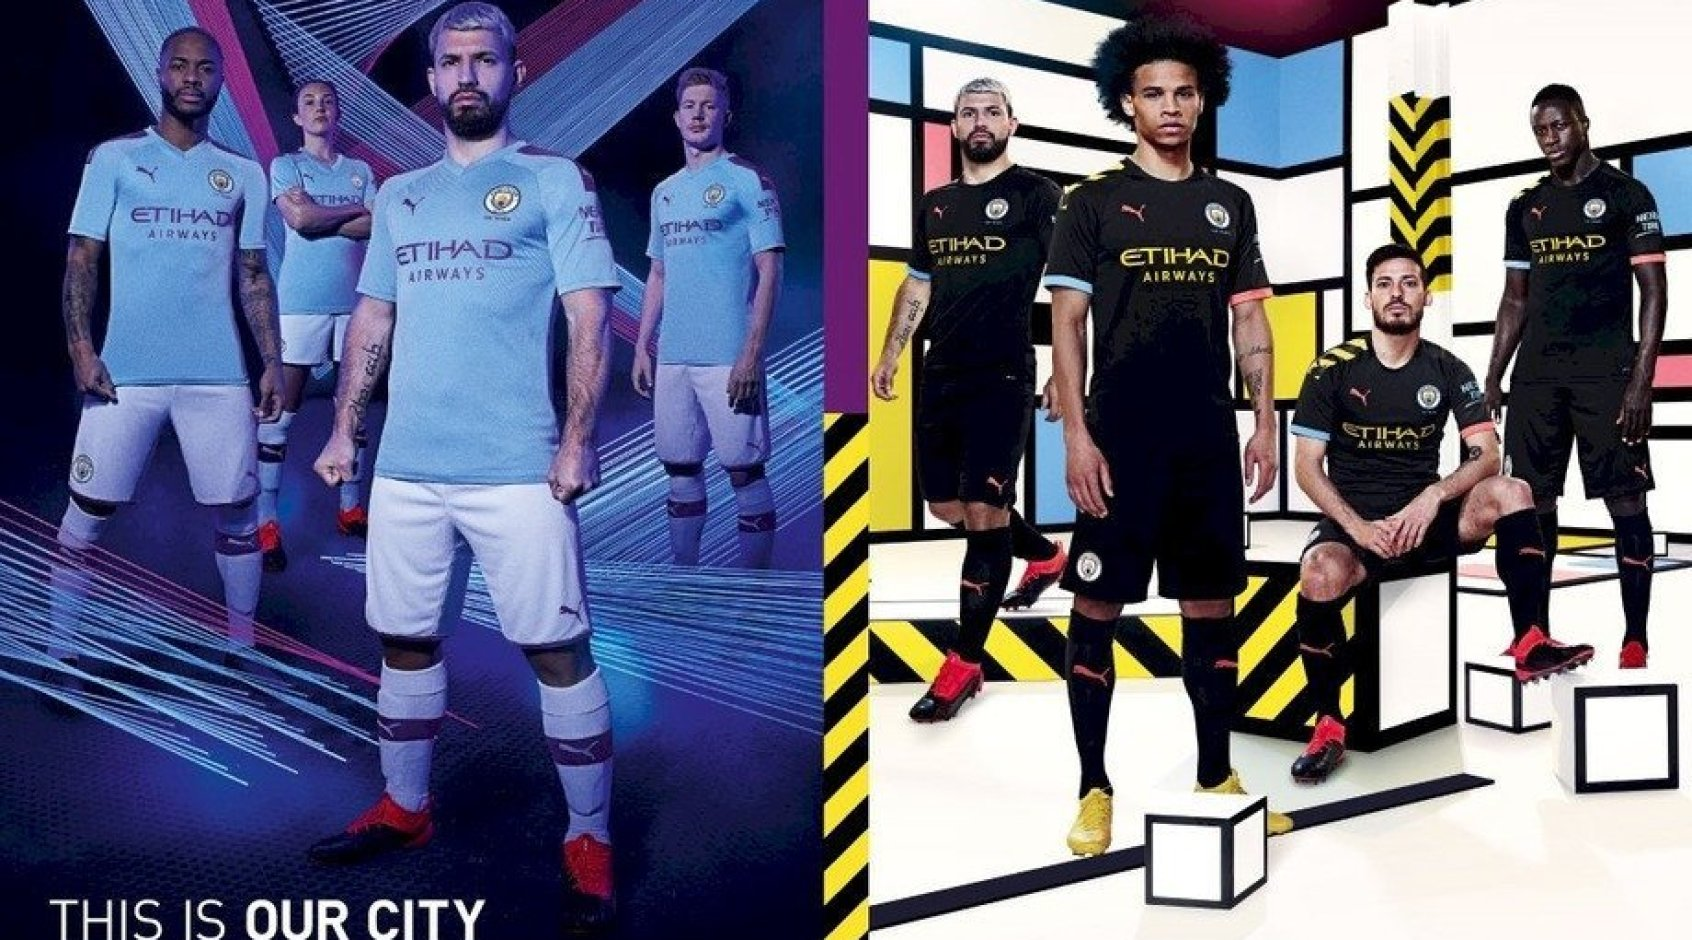 """Манчестер Сити"" представил новую форму в крутом ролике с участием Зинченко (Видео)"